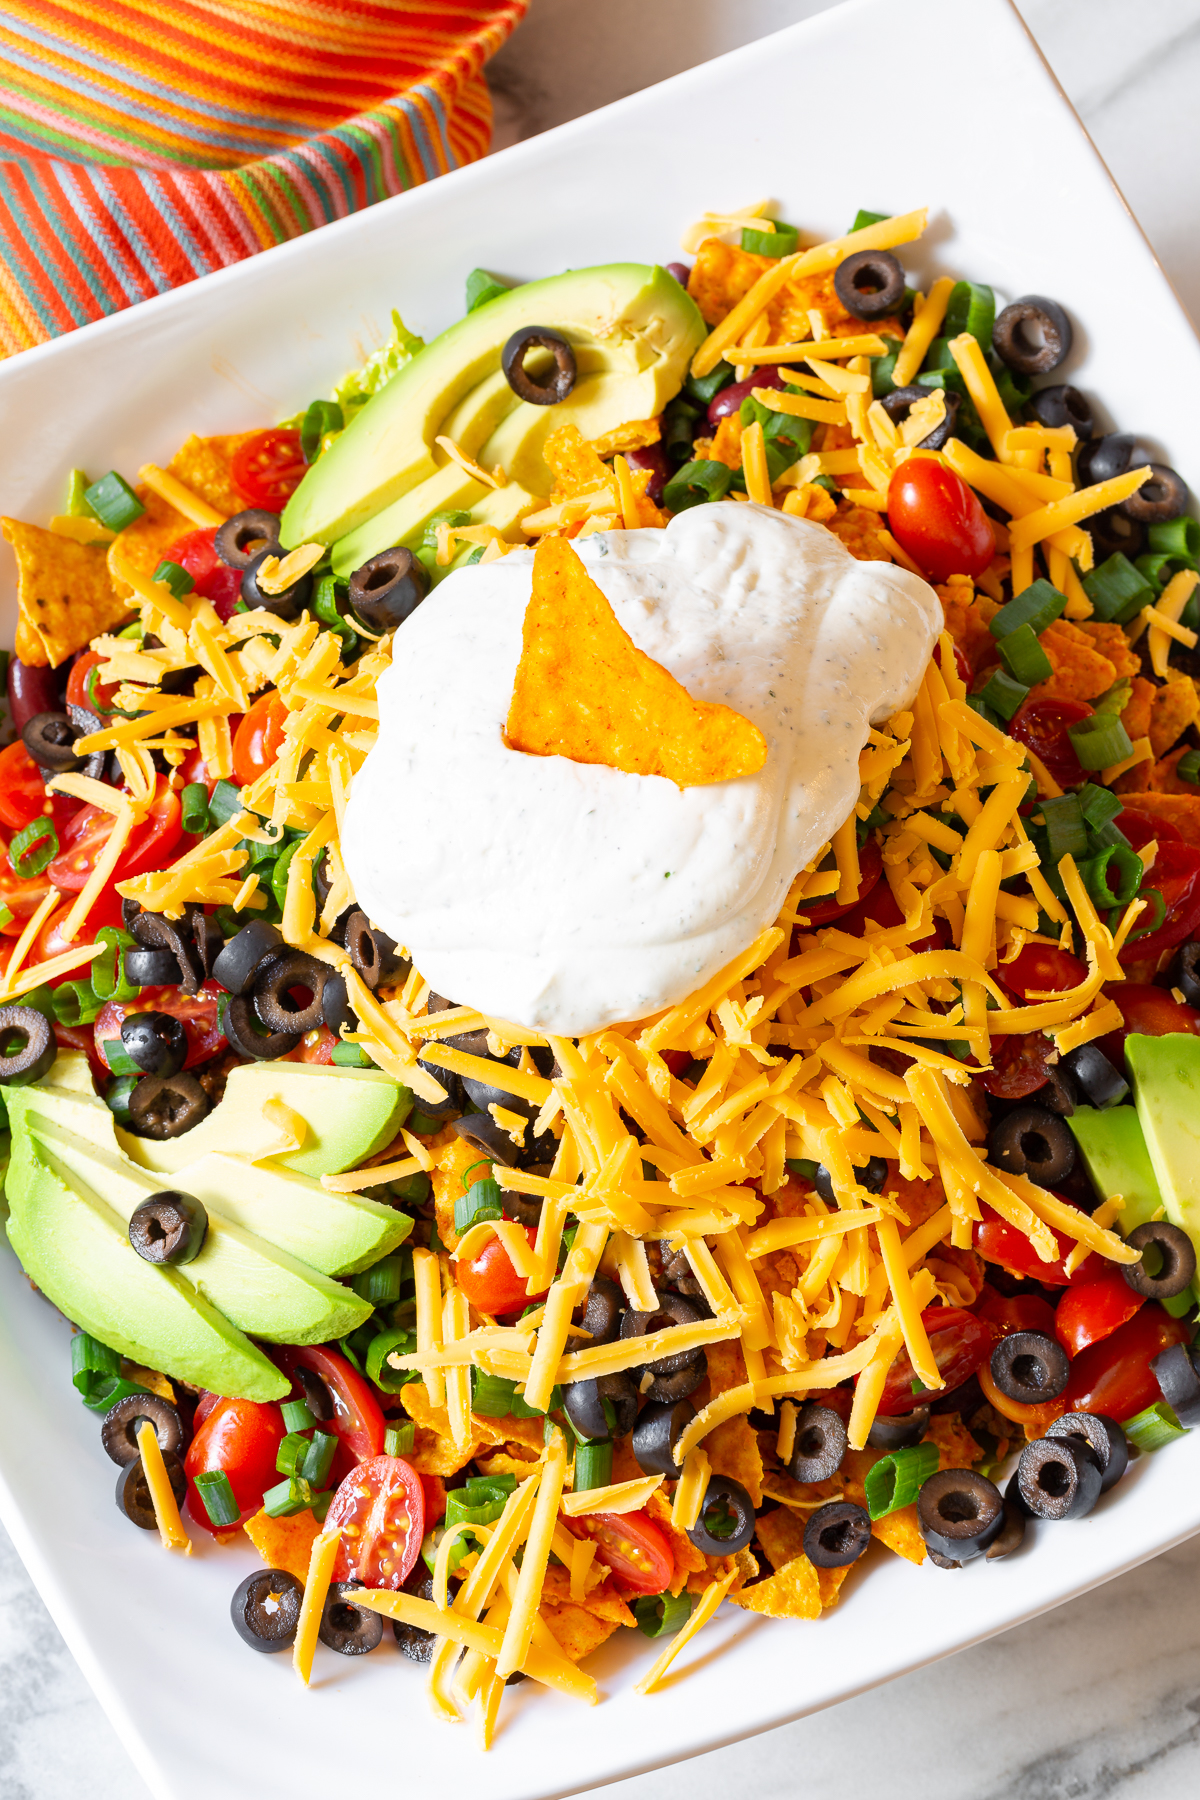 Taco Salad Recipe Ingredients